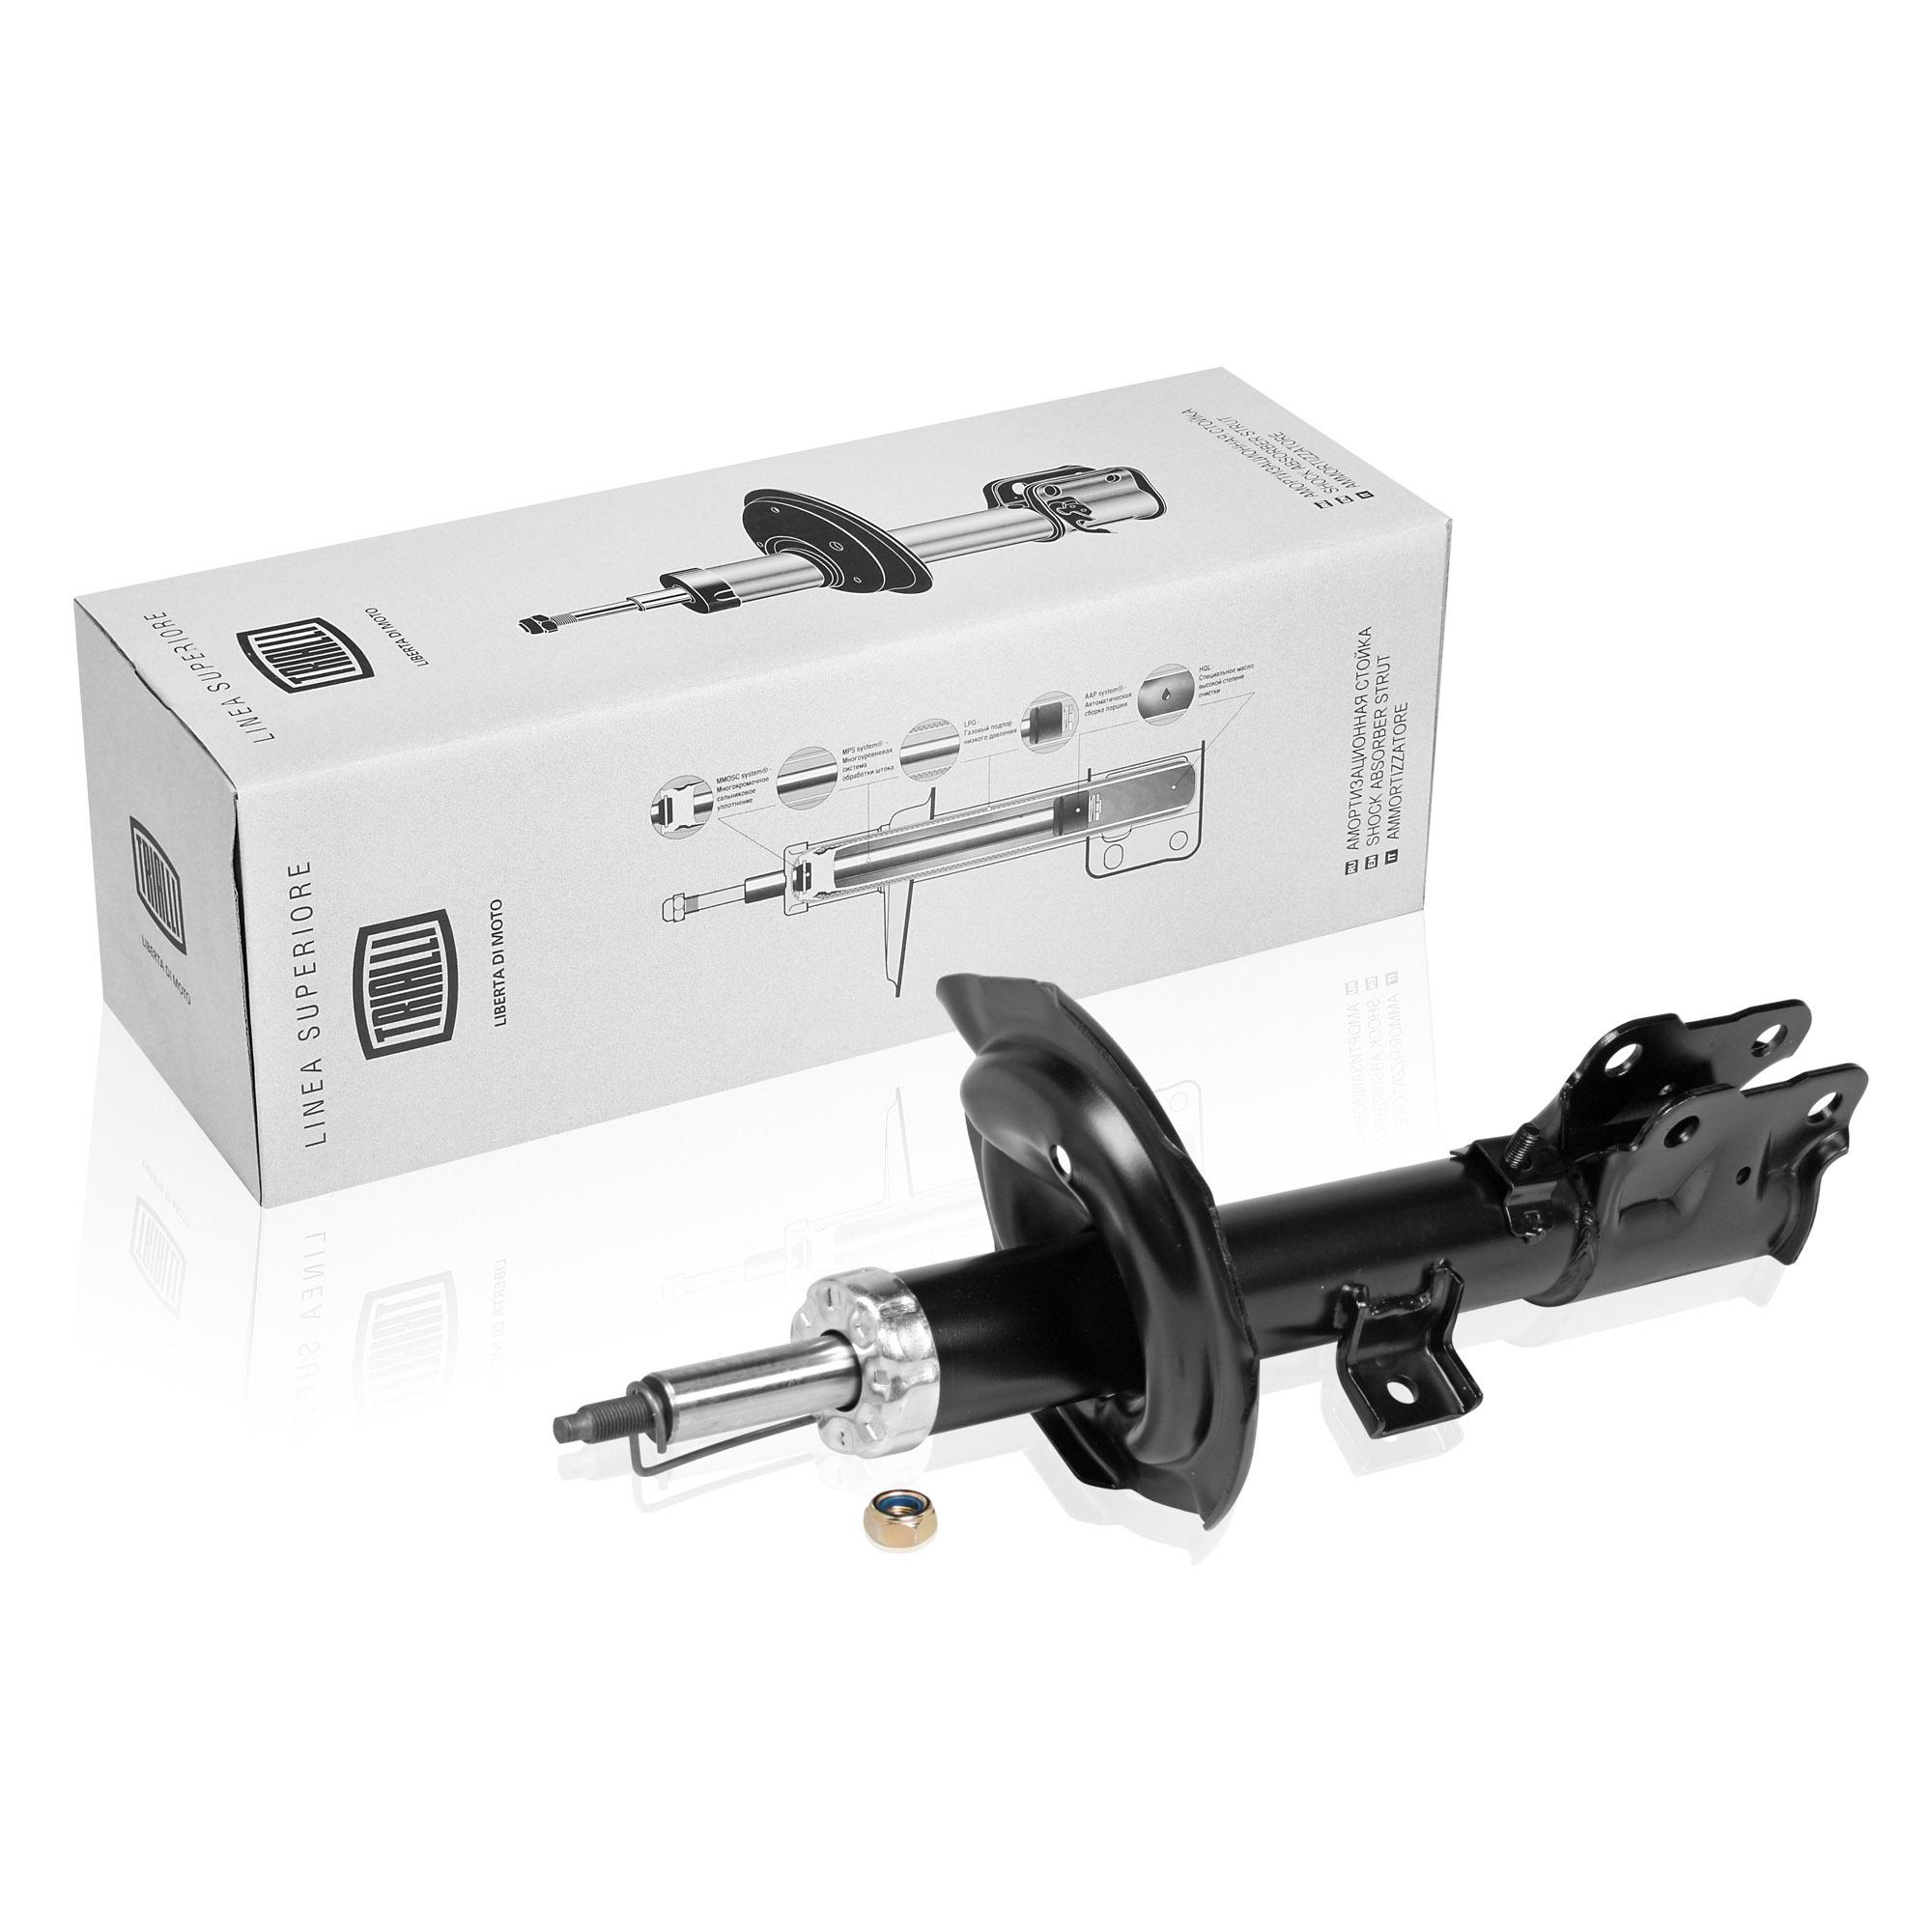 Амортизатор (стойка) передний правый для автомобиля Mitsubishi ASX (10-)\Peugeot 4008 (12-) TRIALLI фото